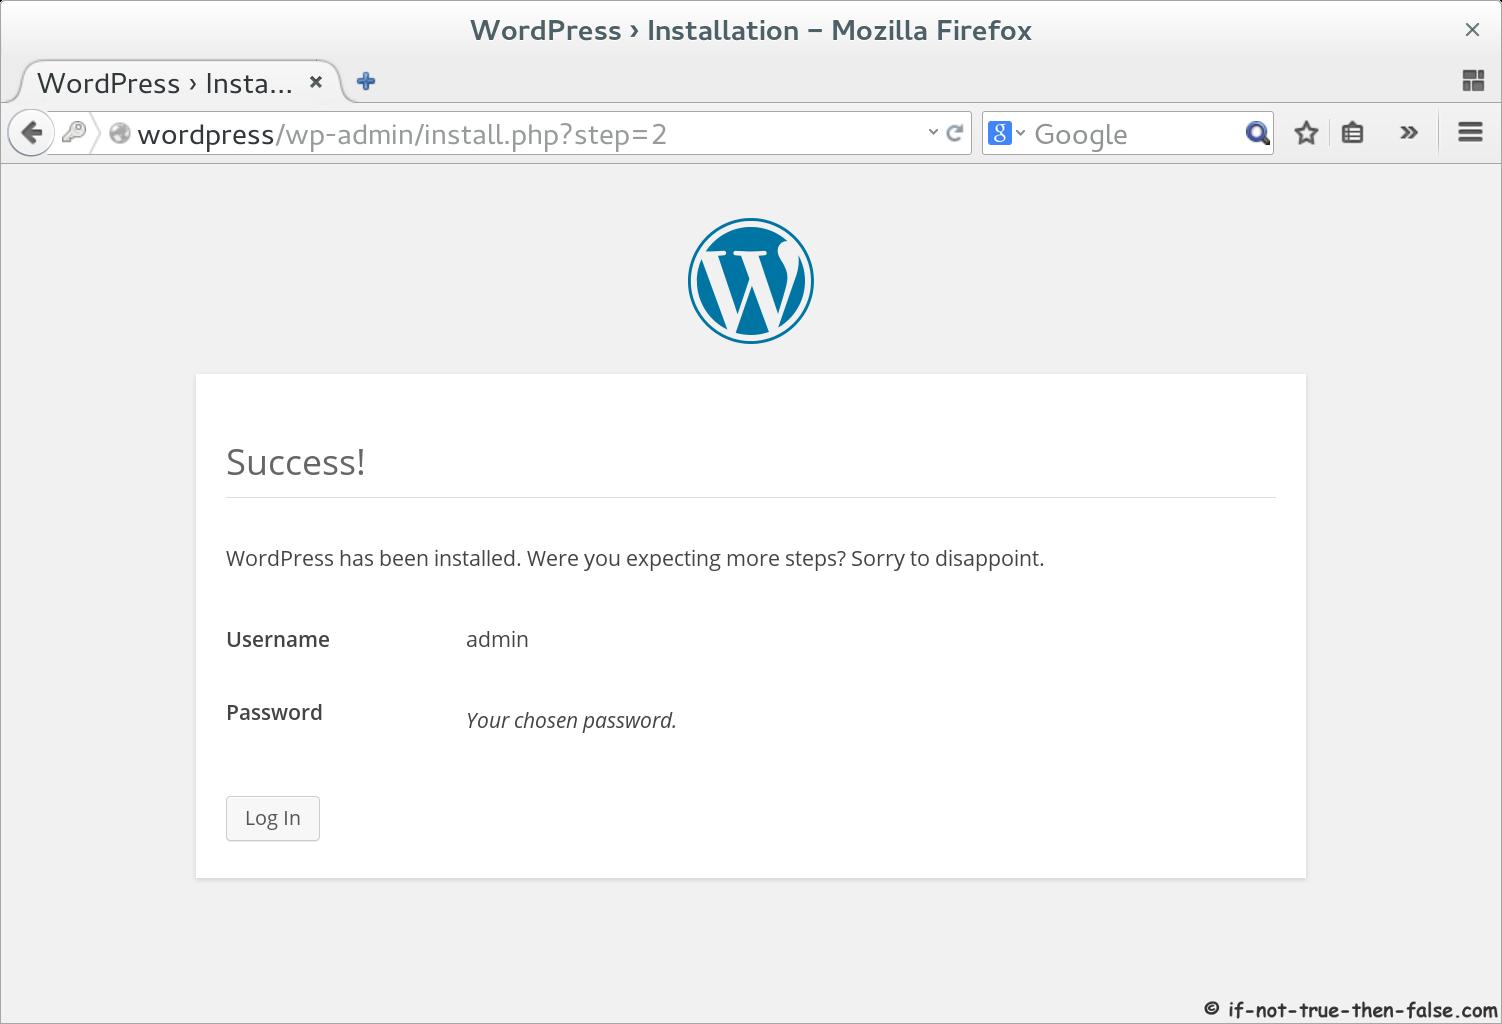 Install WordPress 4.1.1 on Fedora 21/20, CentOS/RHEL 7/6.6/5